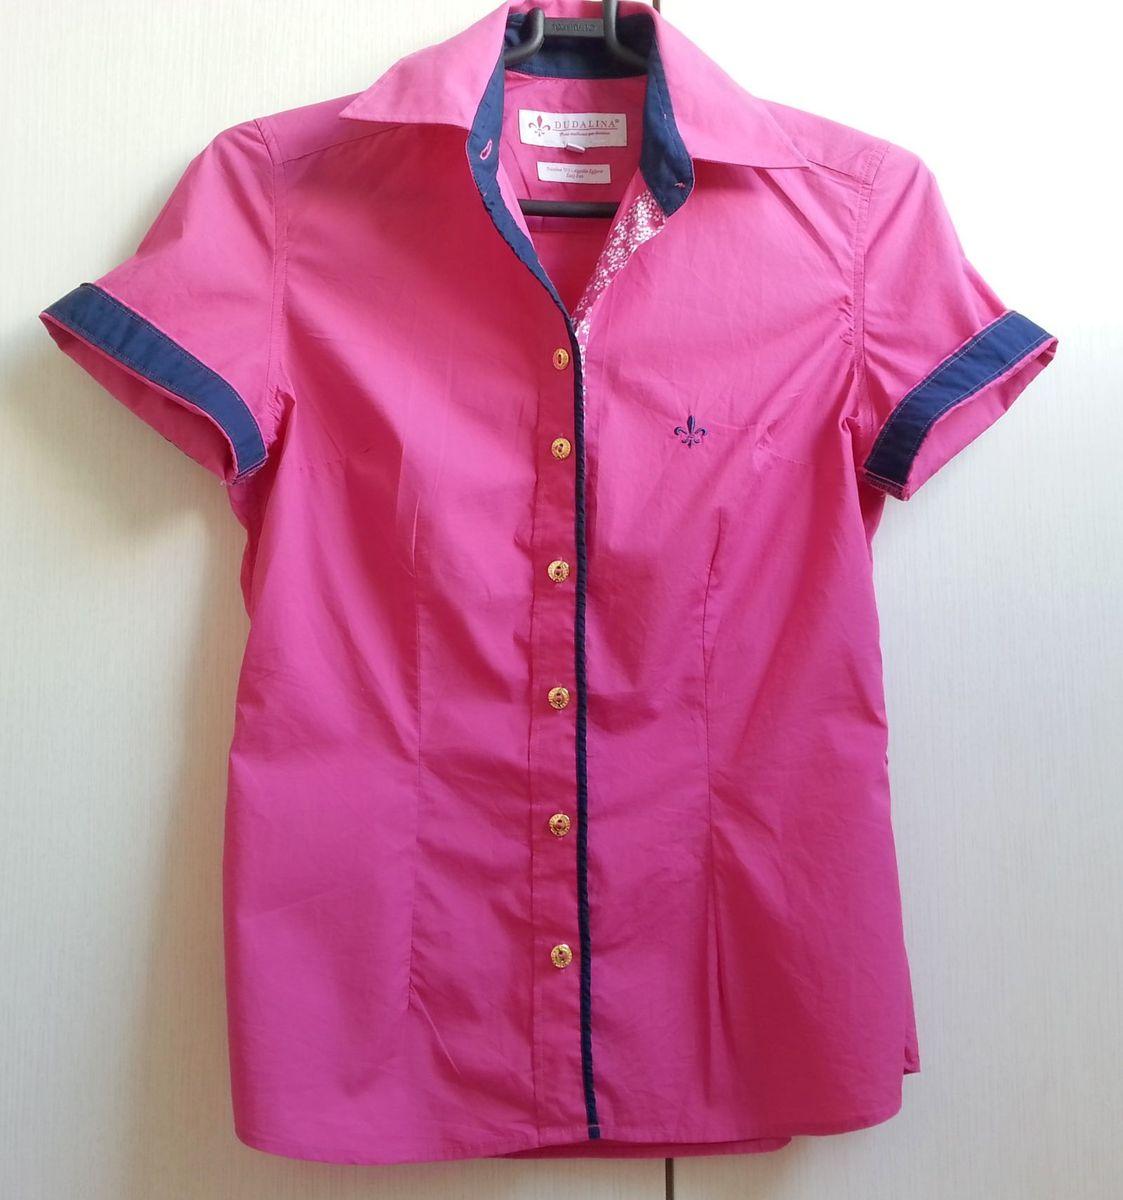 camisa dudalina liiiinda - camisas dudalina.  Czm6ly9wag90b3muzw5qb2vplmnvbs5ici9wcm9kdwn0cy82nte0mi9hmgjmztuwodg4yjdhyzkzndu3zgmzmju3njhkzjdiyi5qcgc  ... 97efecf3a212f